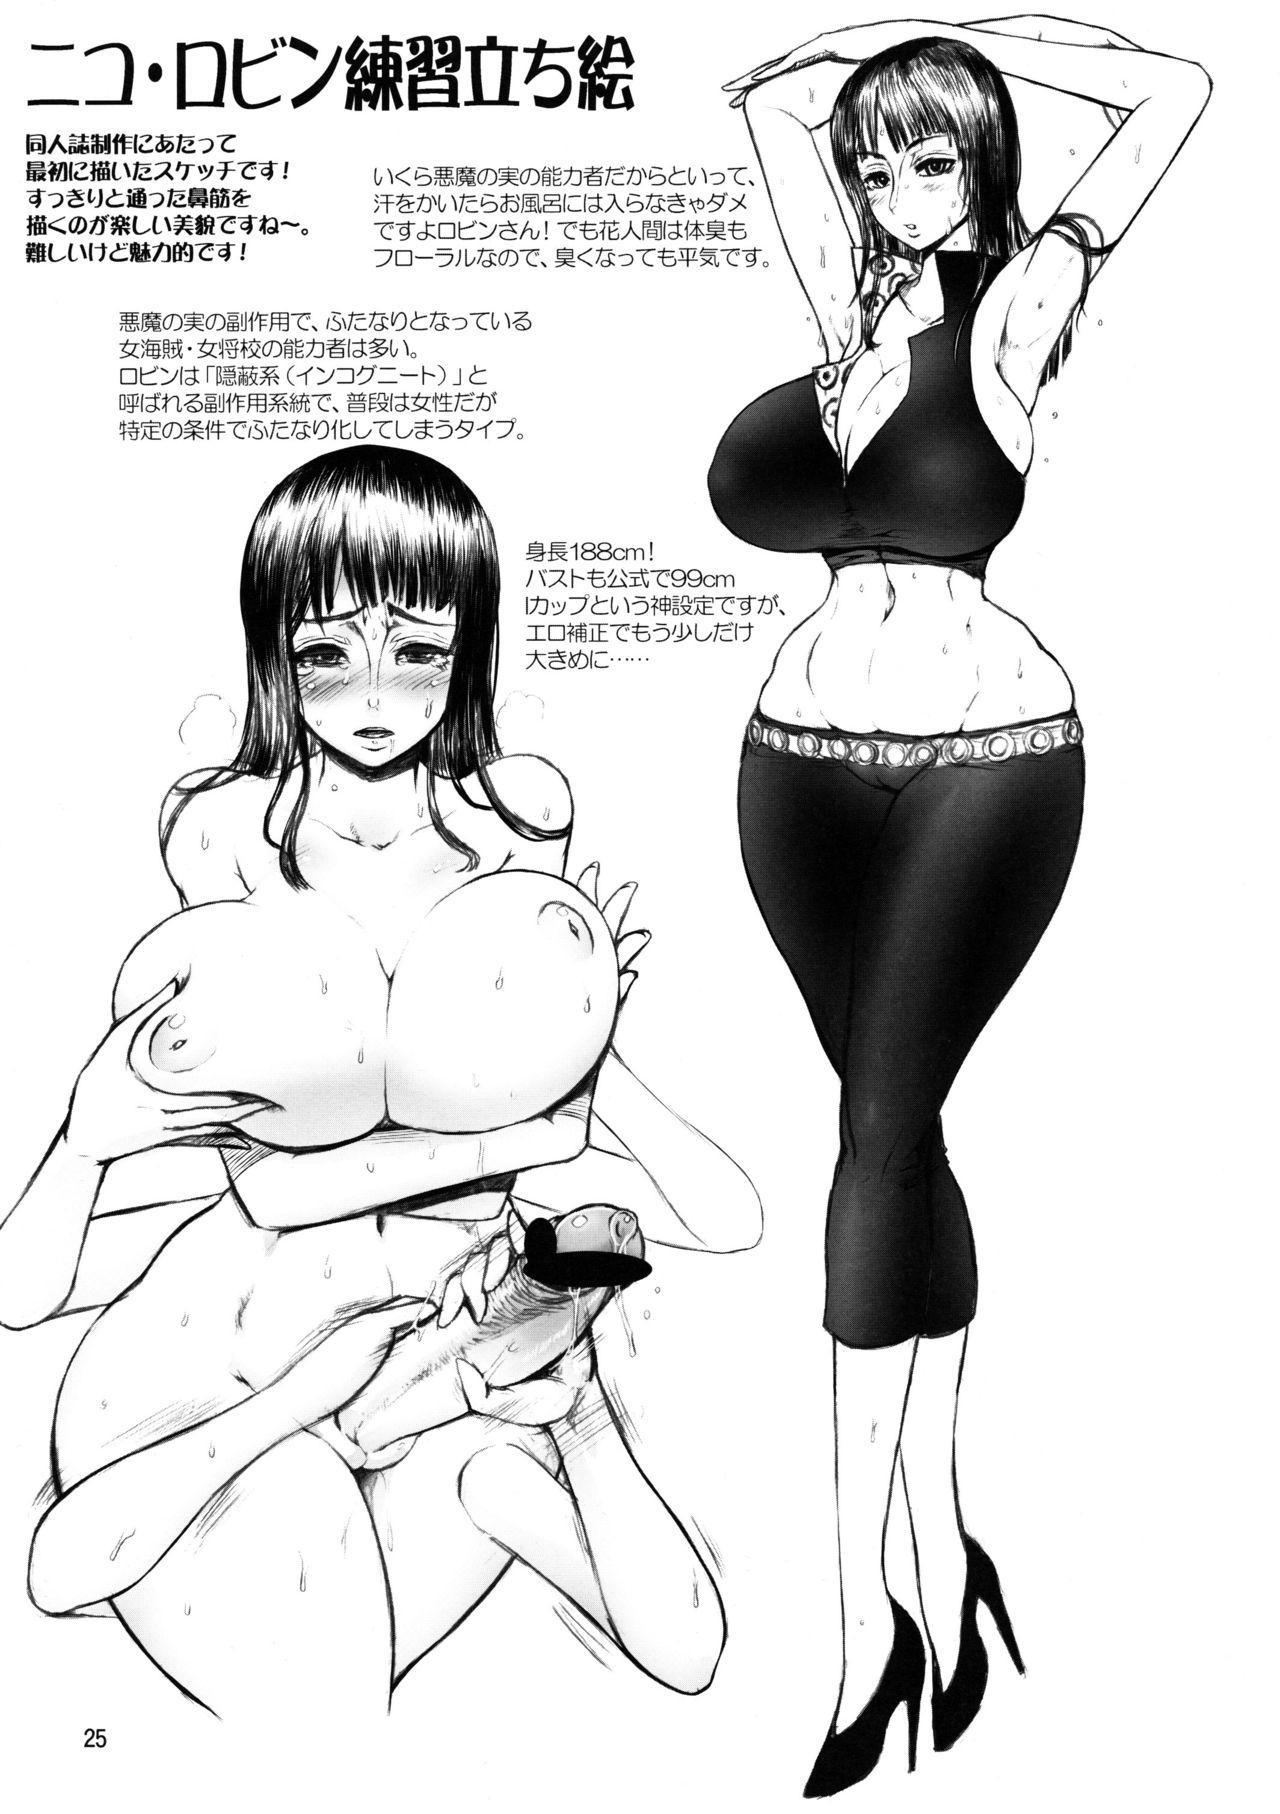 Midare Saki Joshuu Kaizoku Soushuuhen   Bloom, Pirate Hooker! Bloom! Annual 24